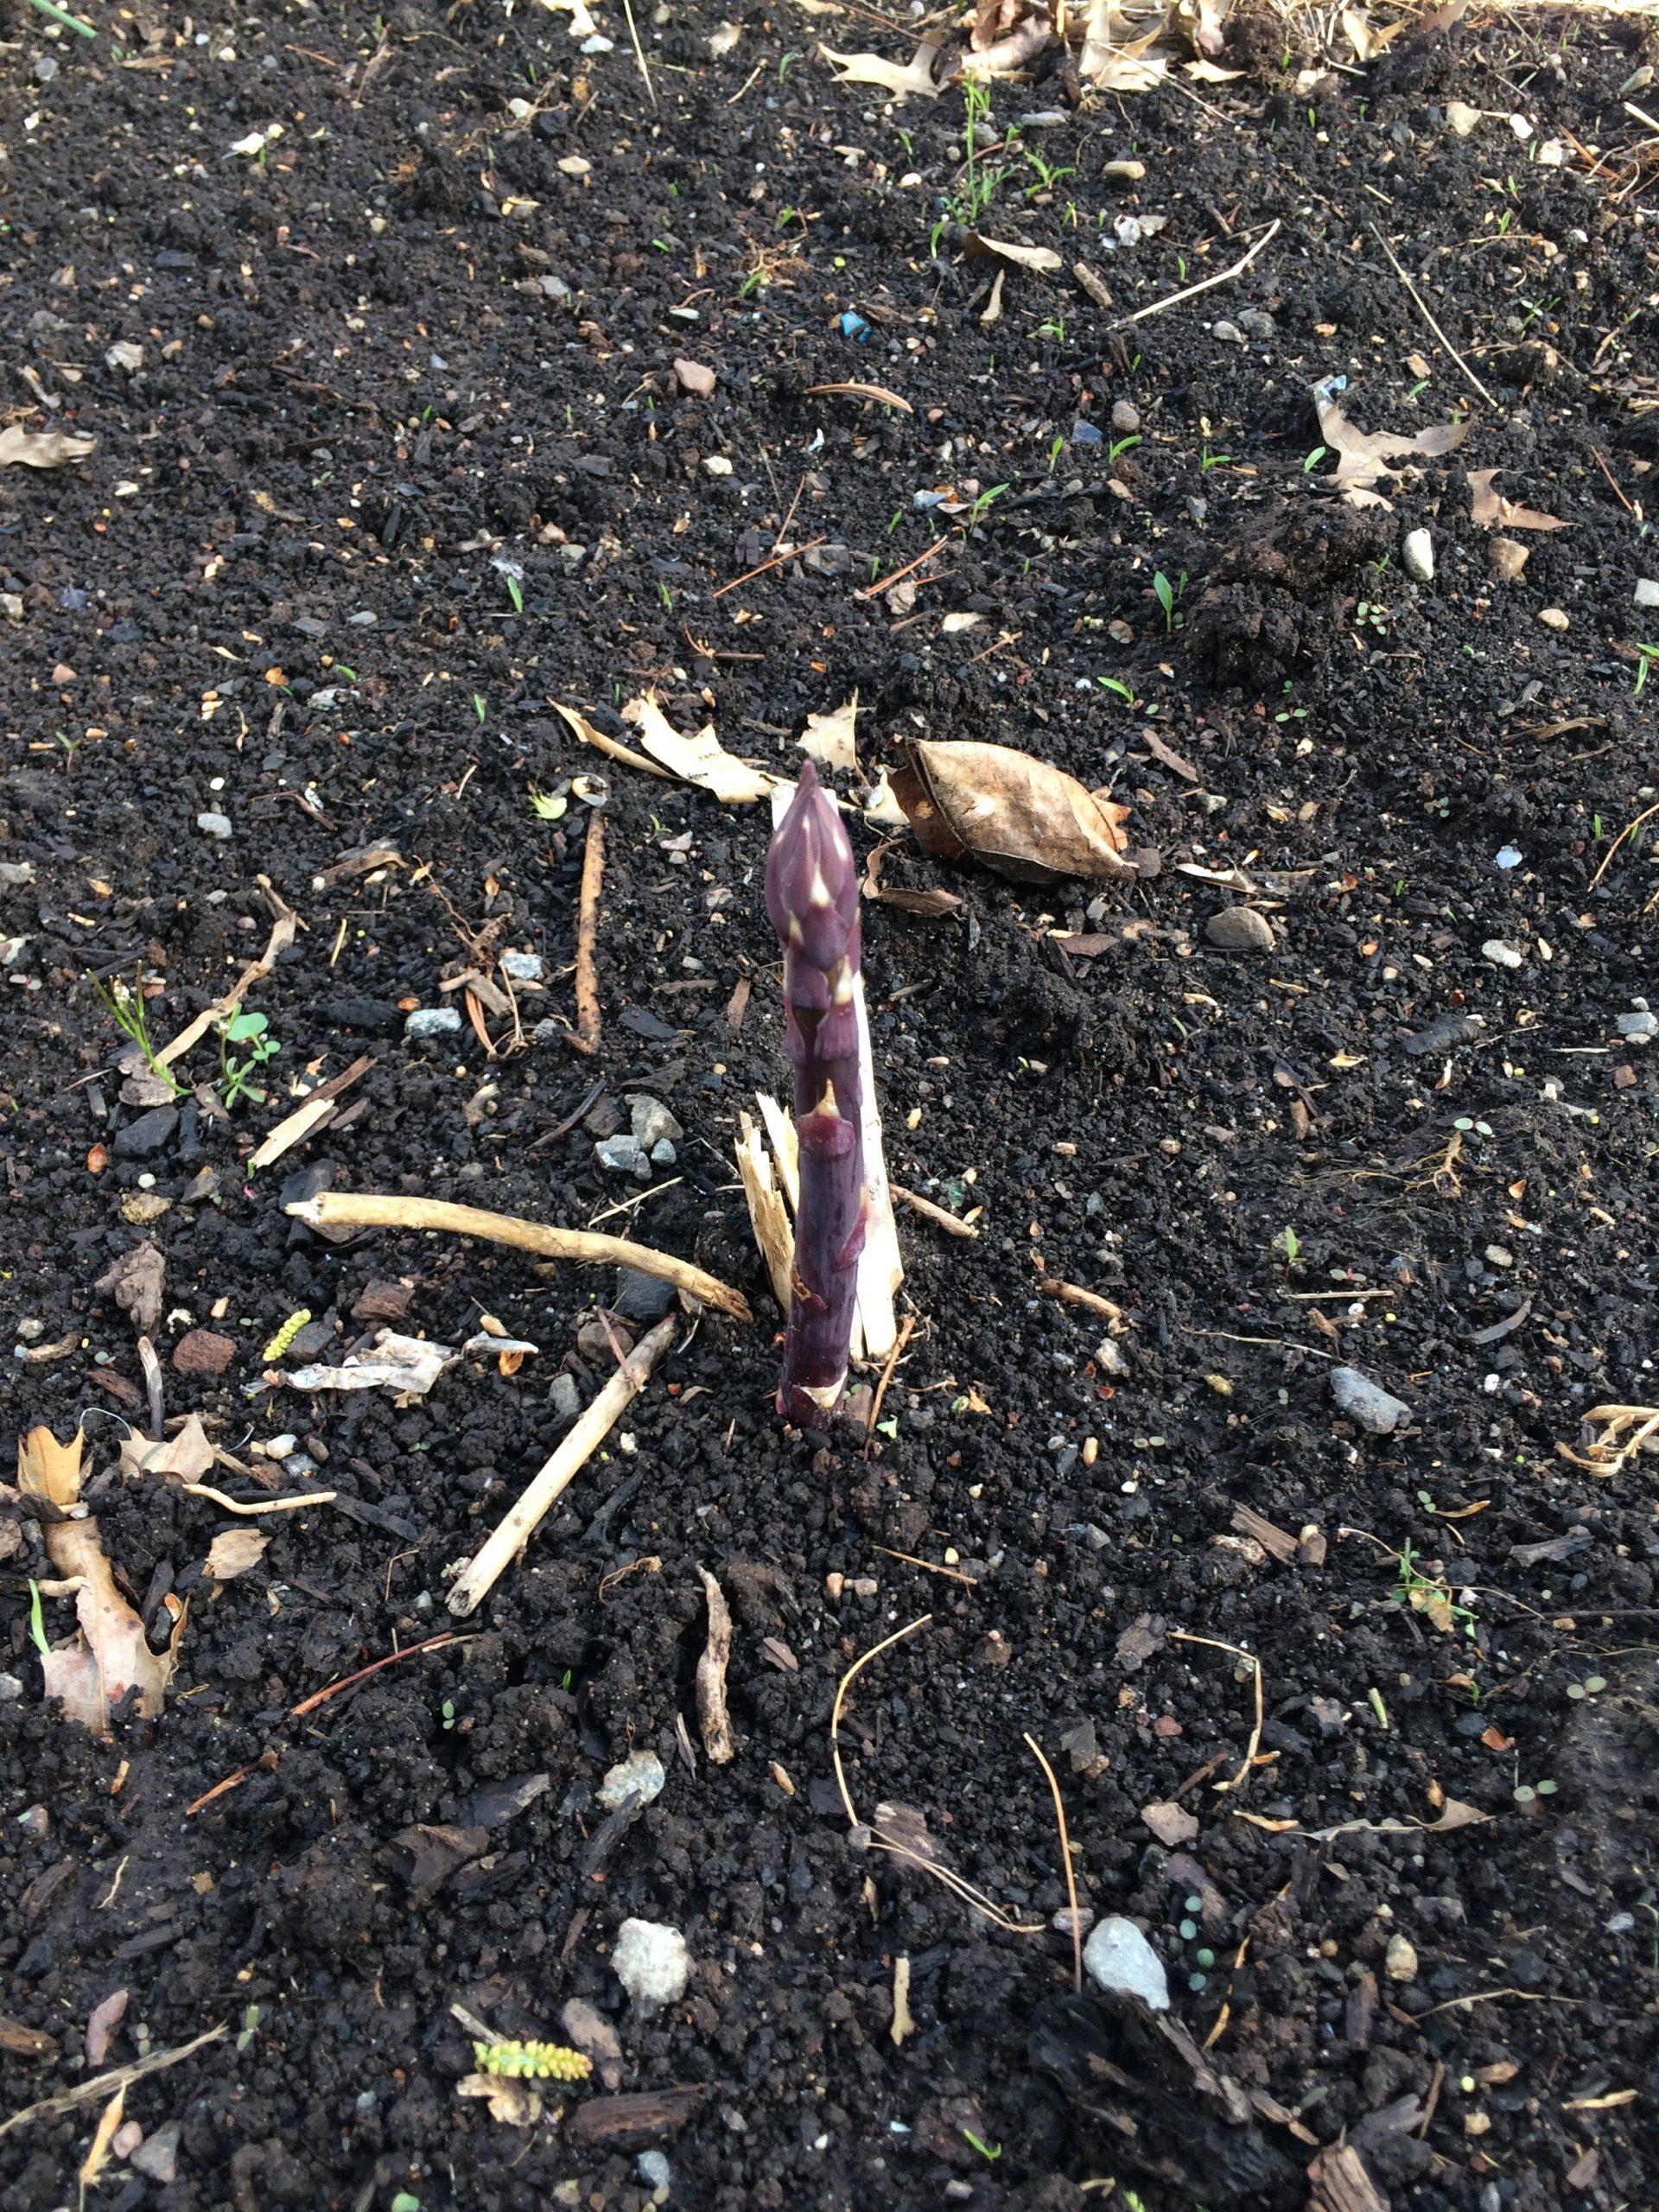 asparagus in the soil